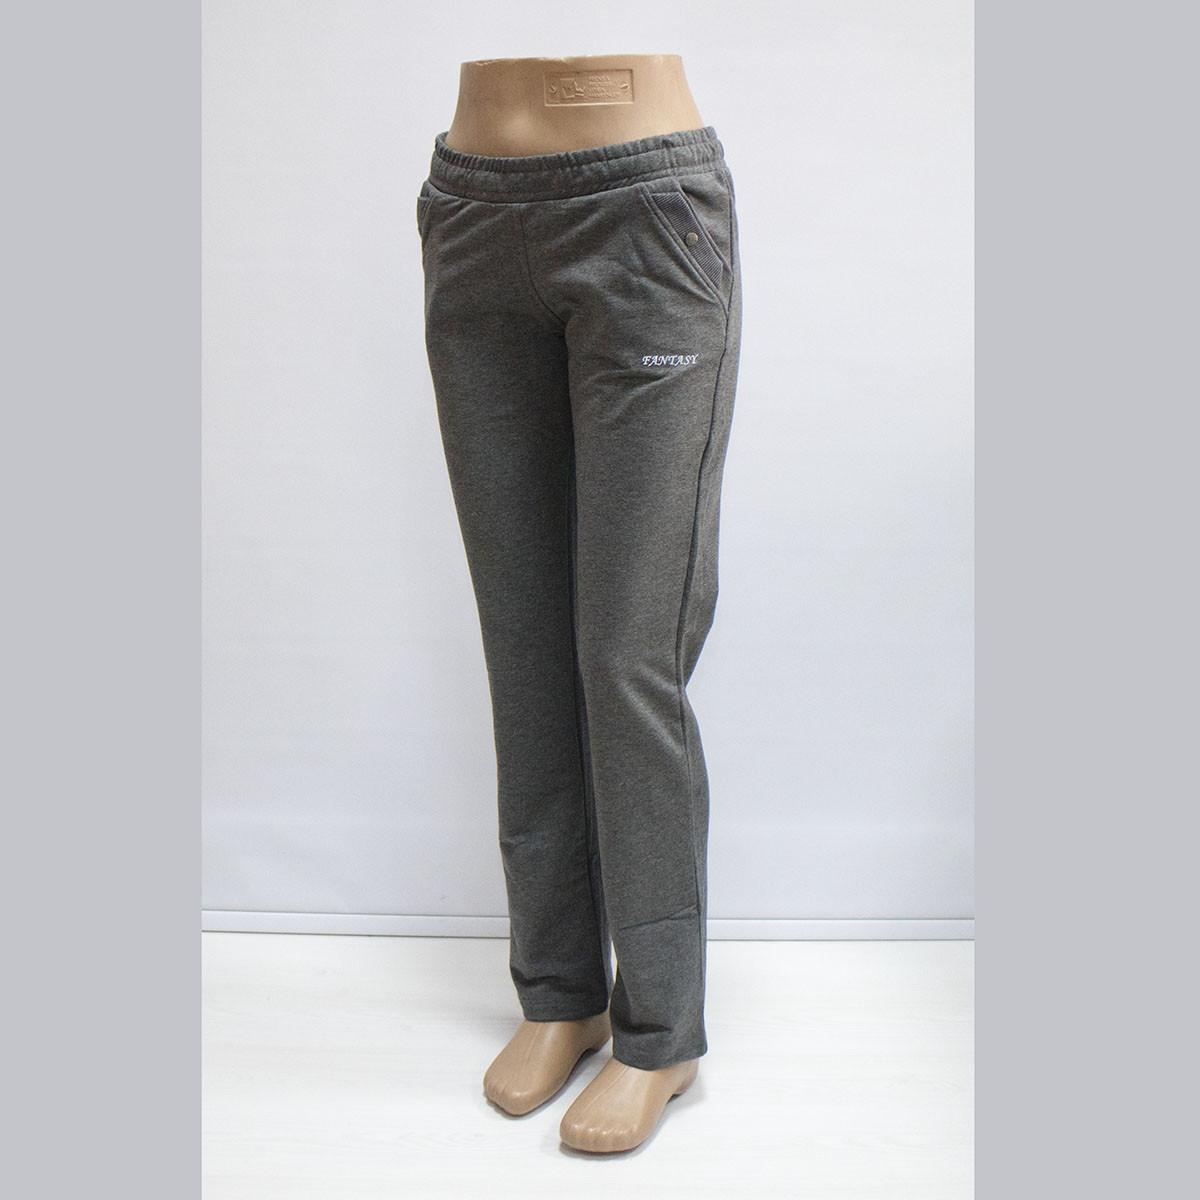 пошив спортивных брюк